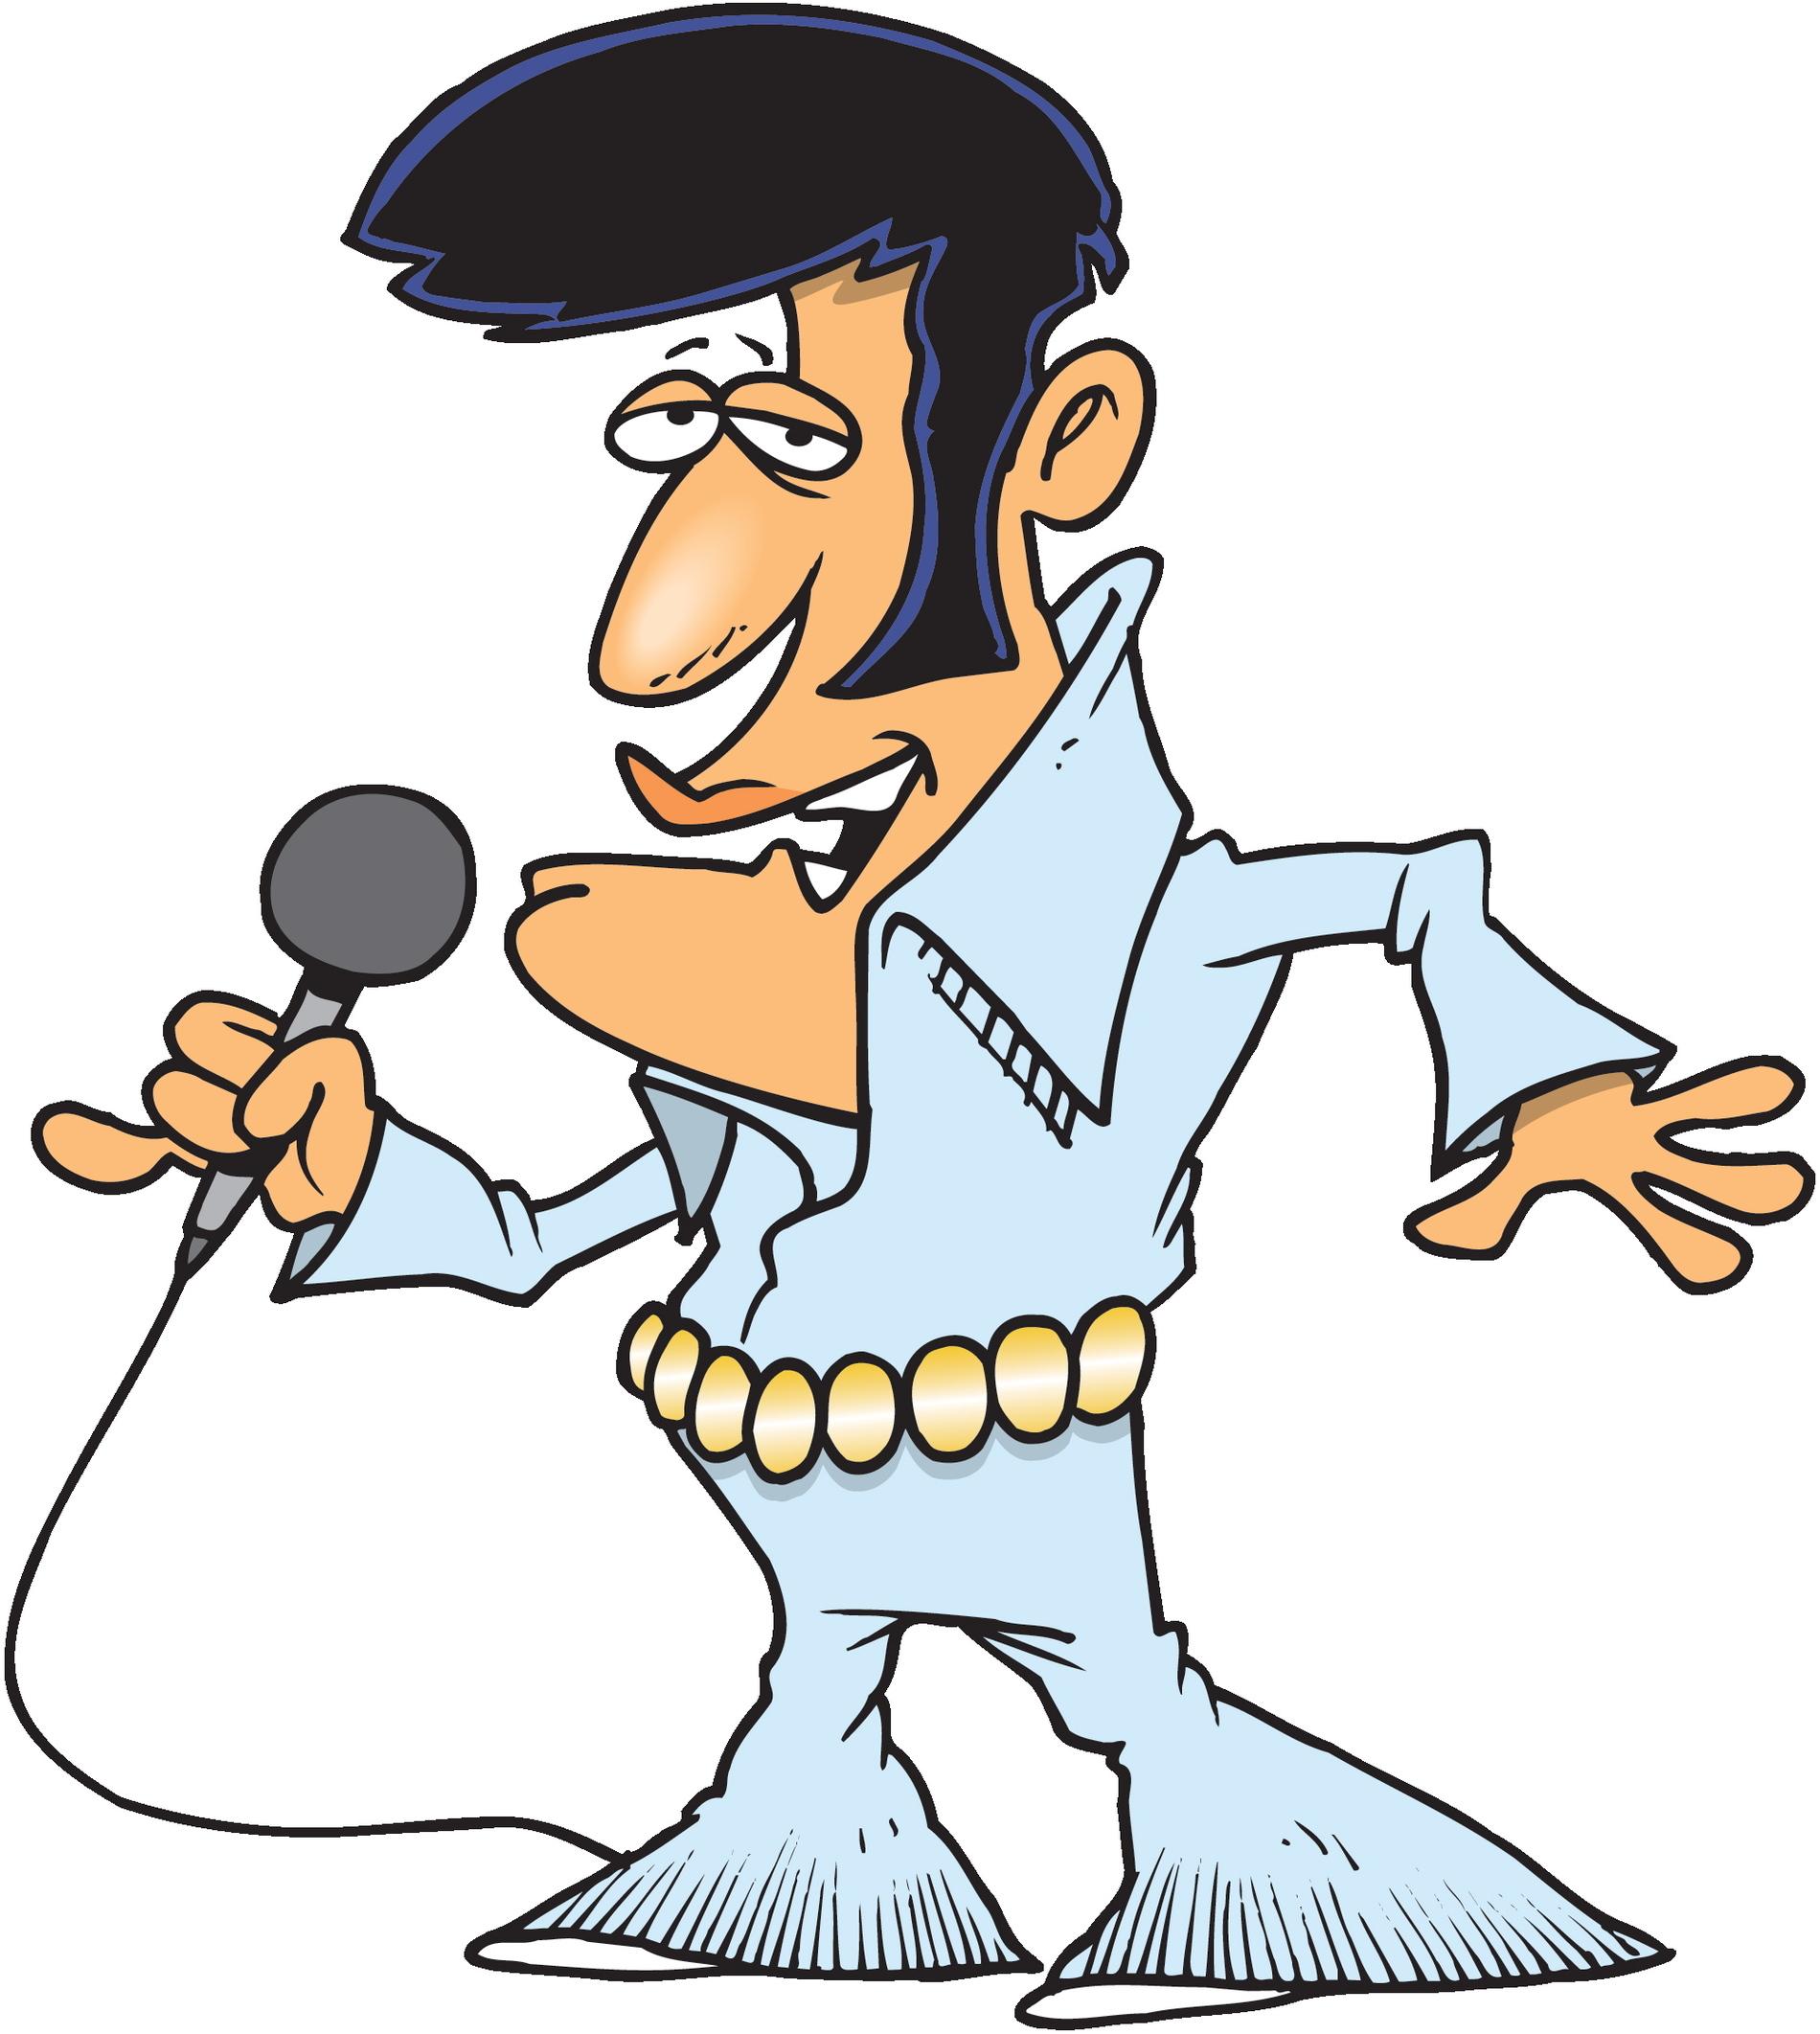 Hair clipart elvis hair Elvis Elvis Style Silhouette Clipart